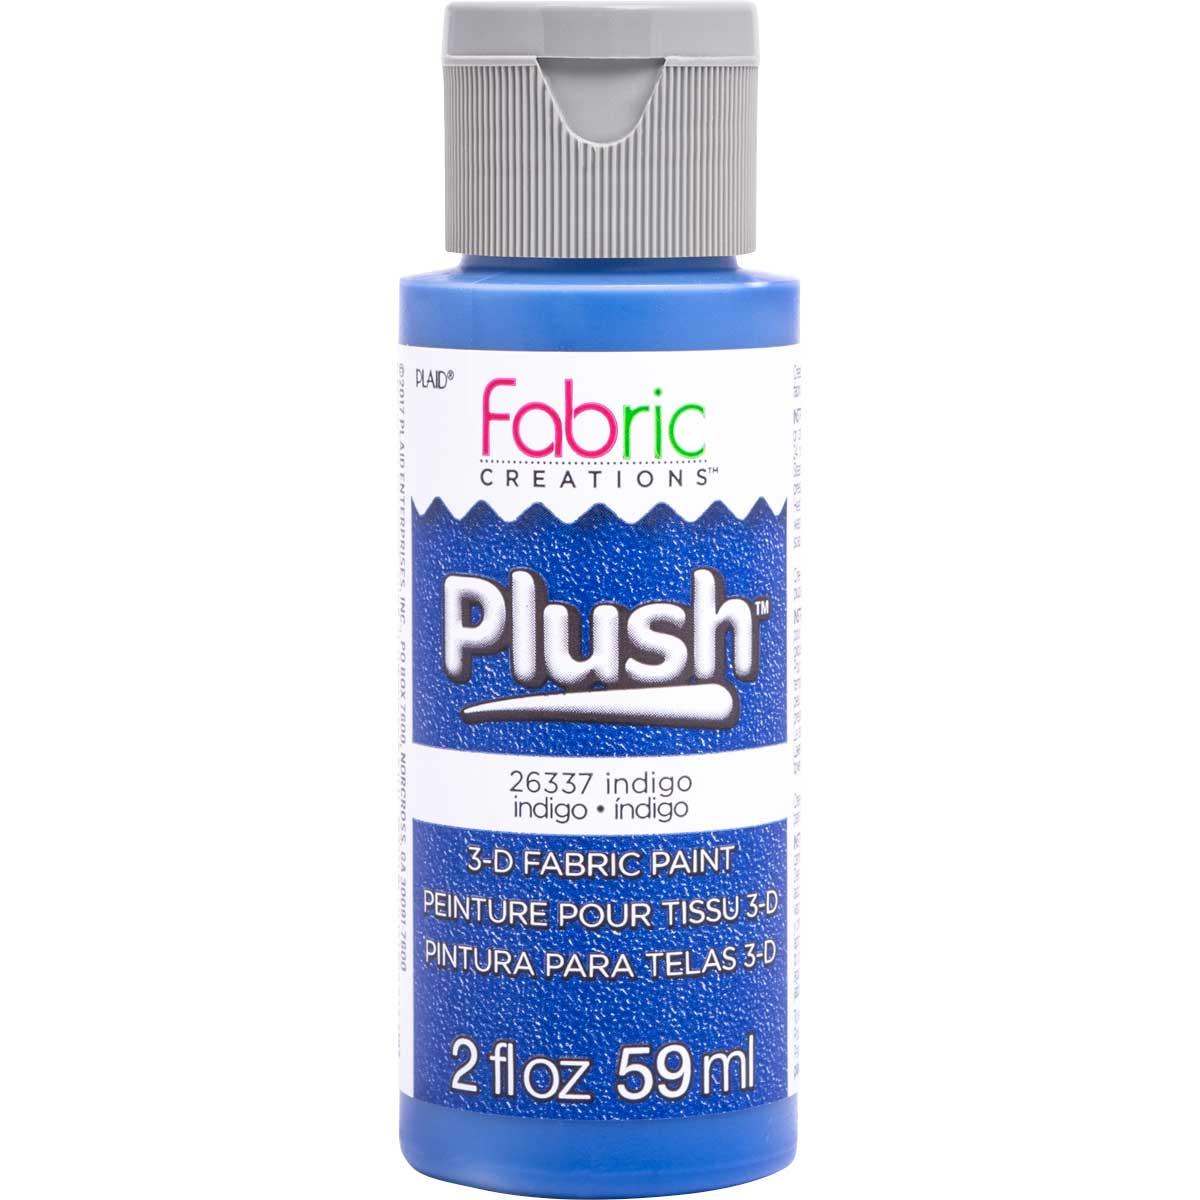 Fabric Creations™ Plush™ 3-D Fabric Paints - Indigo, 2 oz.